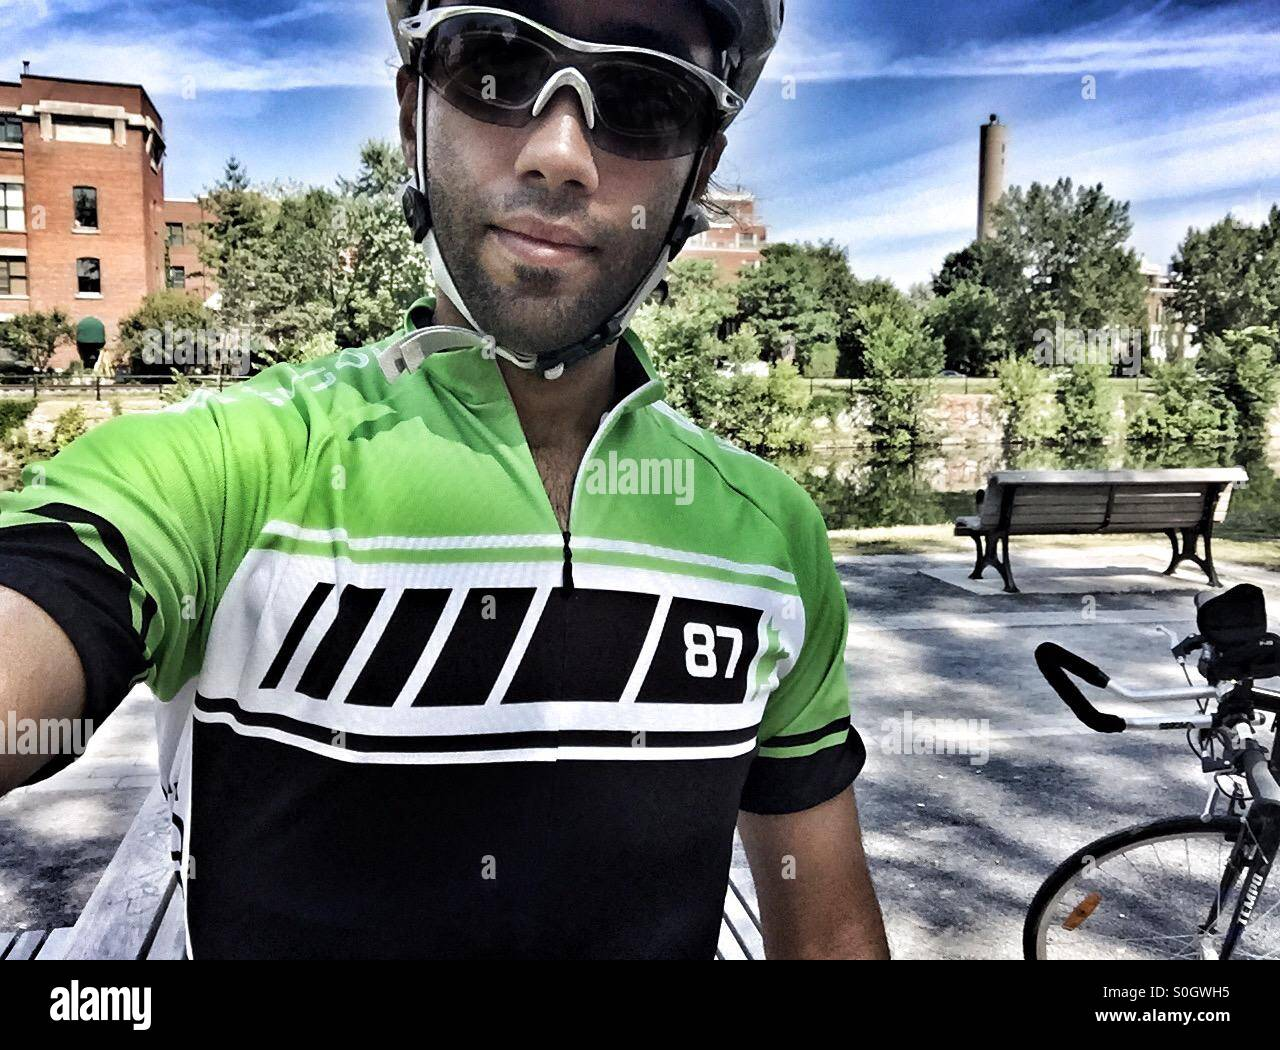 Cyclist selfie - Stock Image